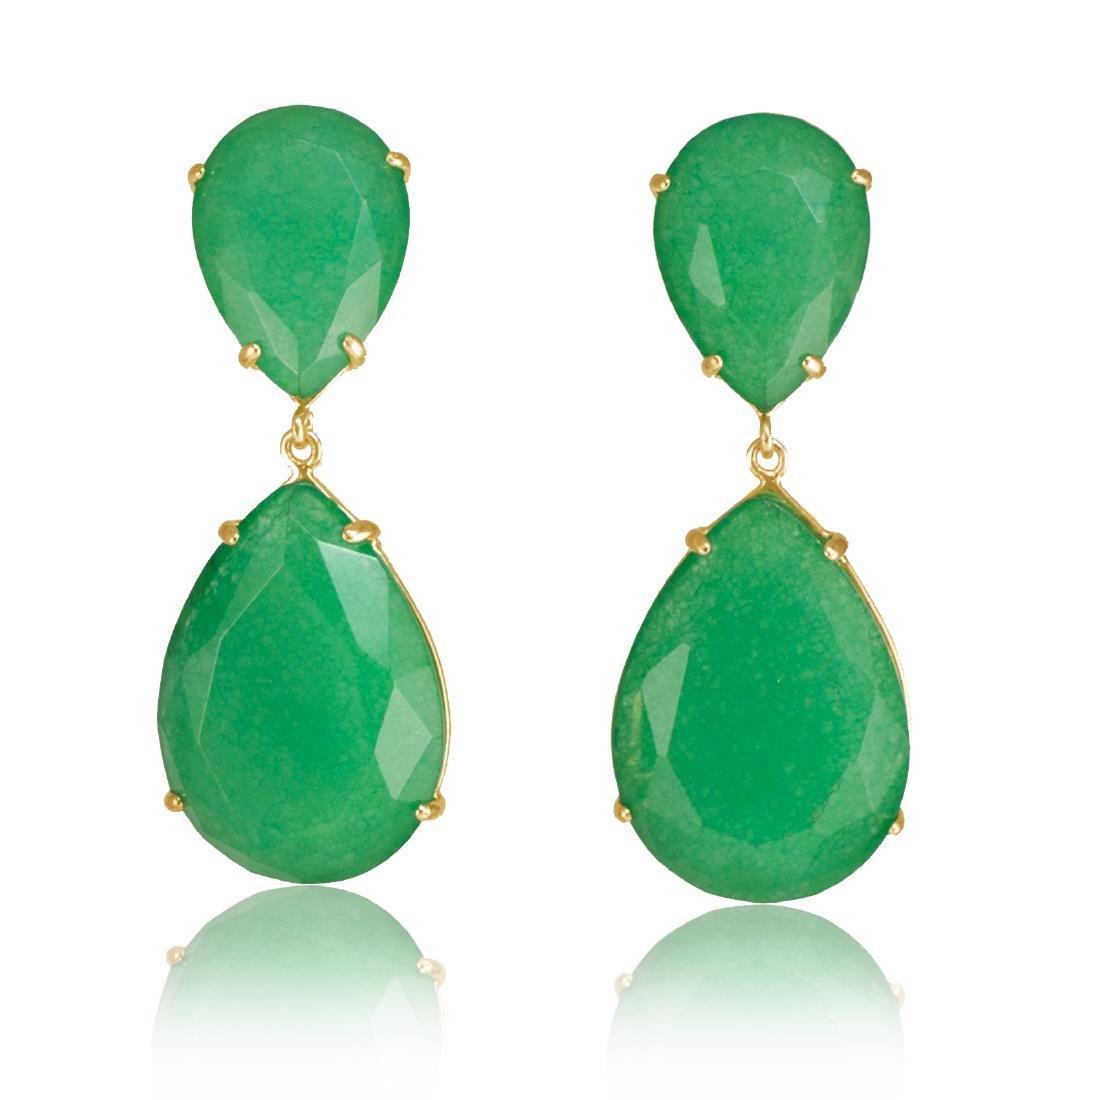 Emerald Green Jade Two Parts Earrings